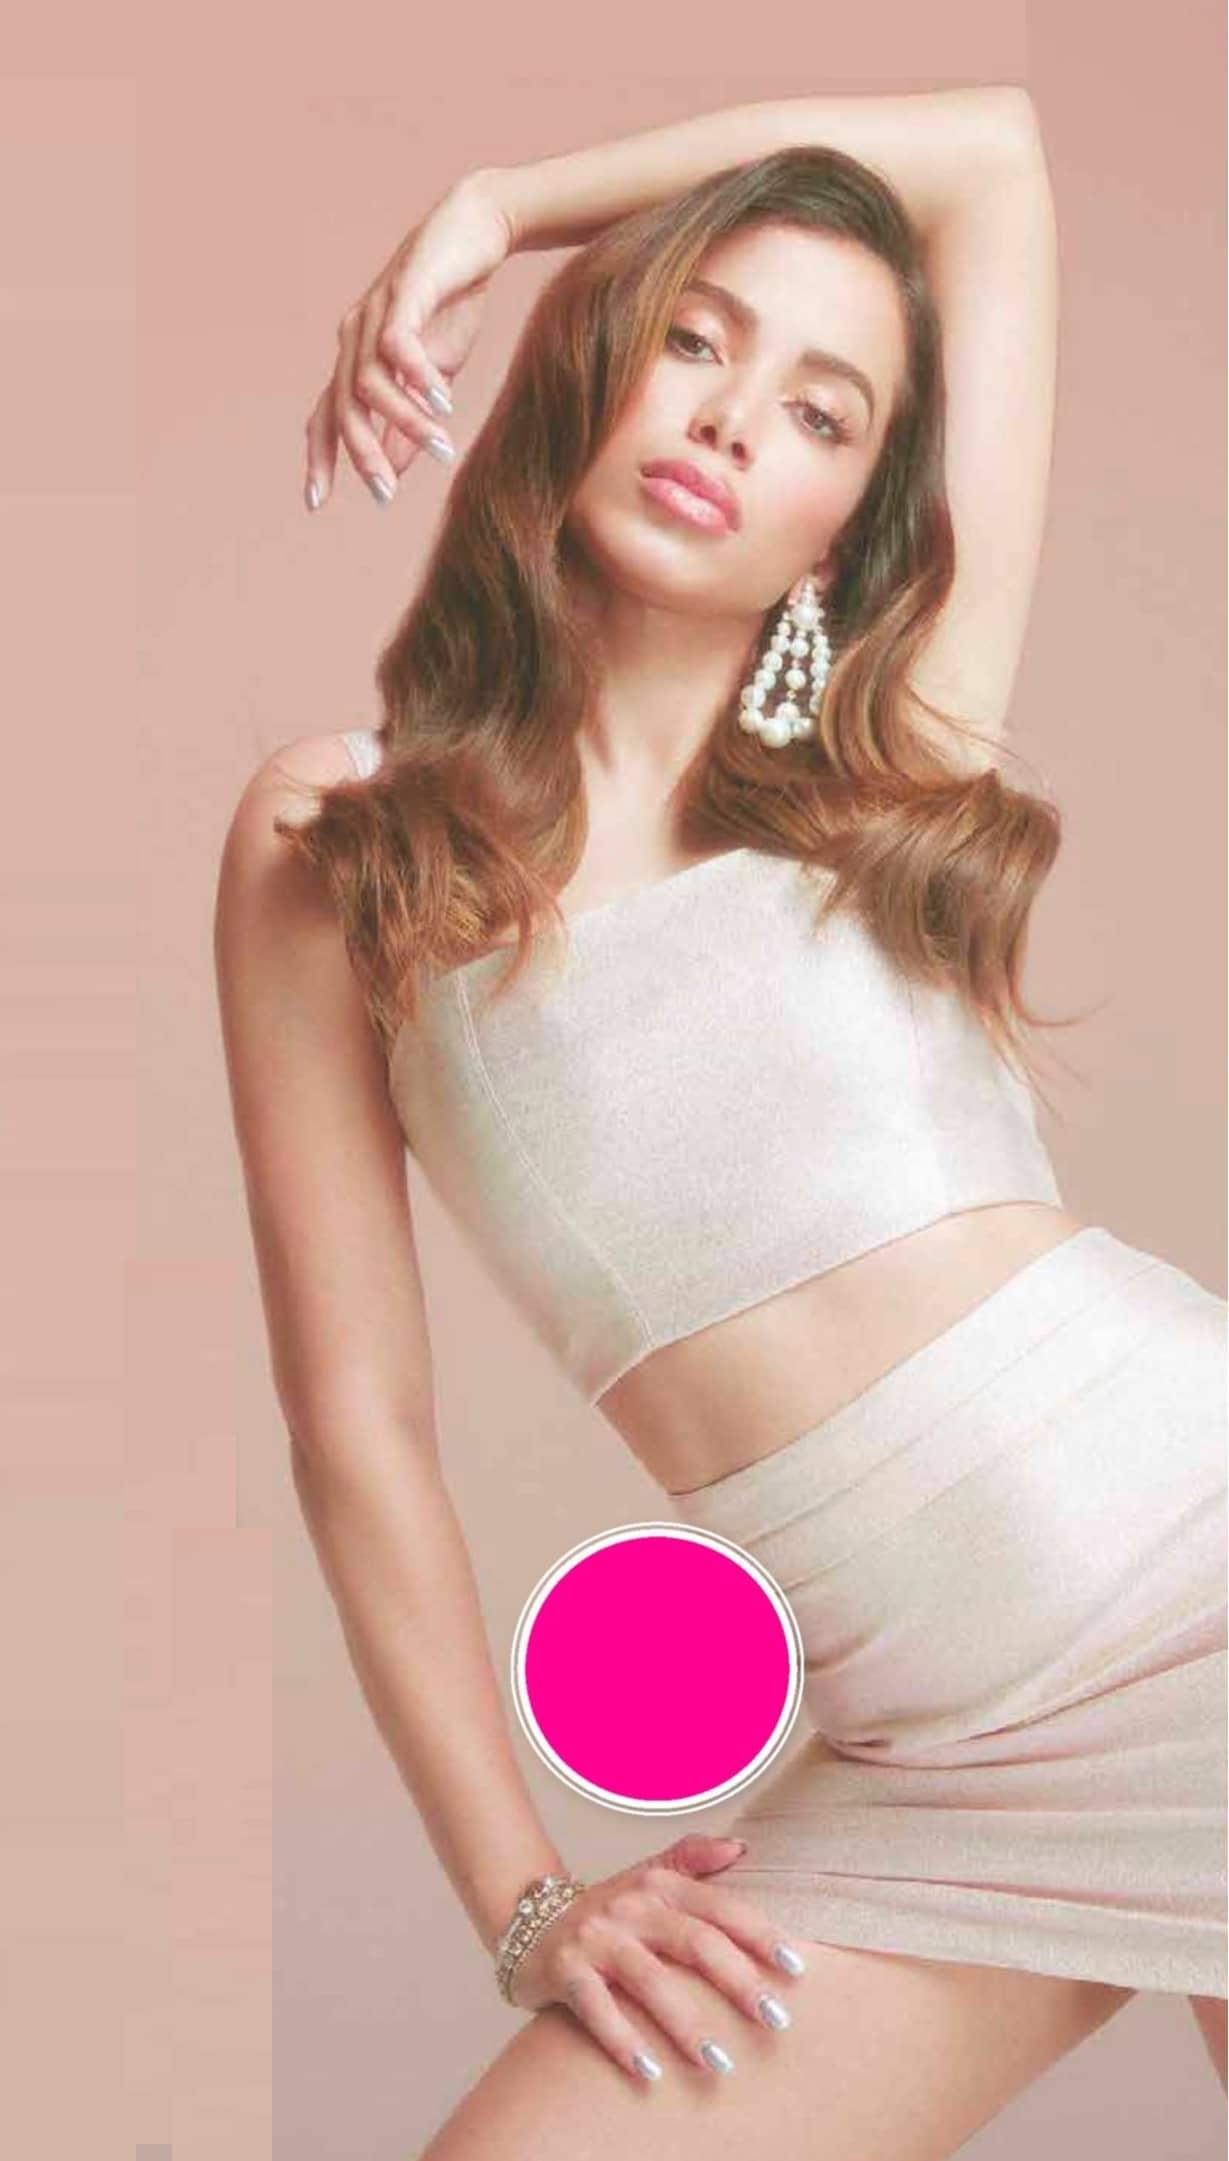 Anitta: La Regga Etonera Que Empodera A La Mujer